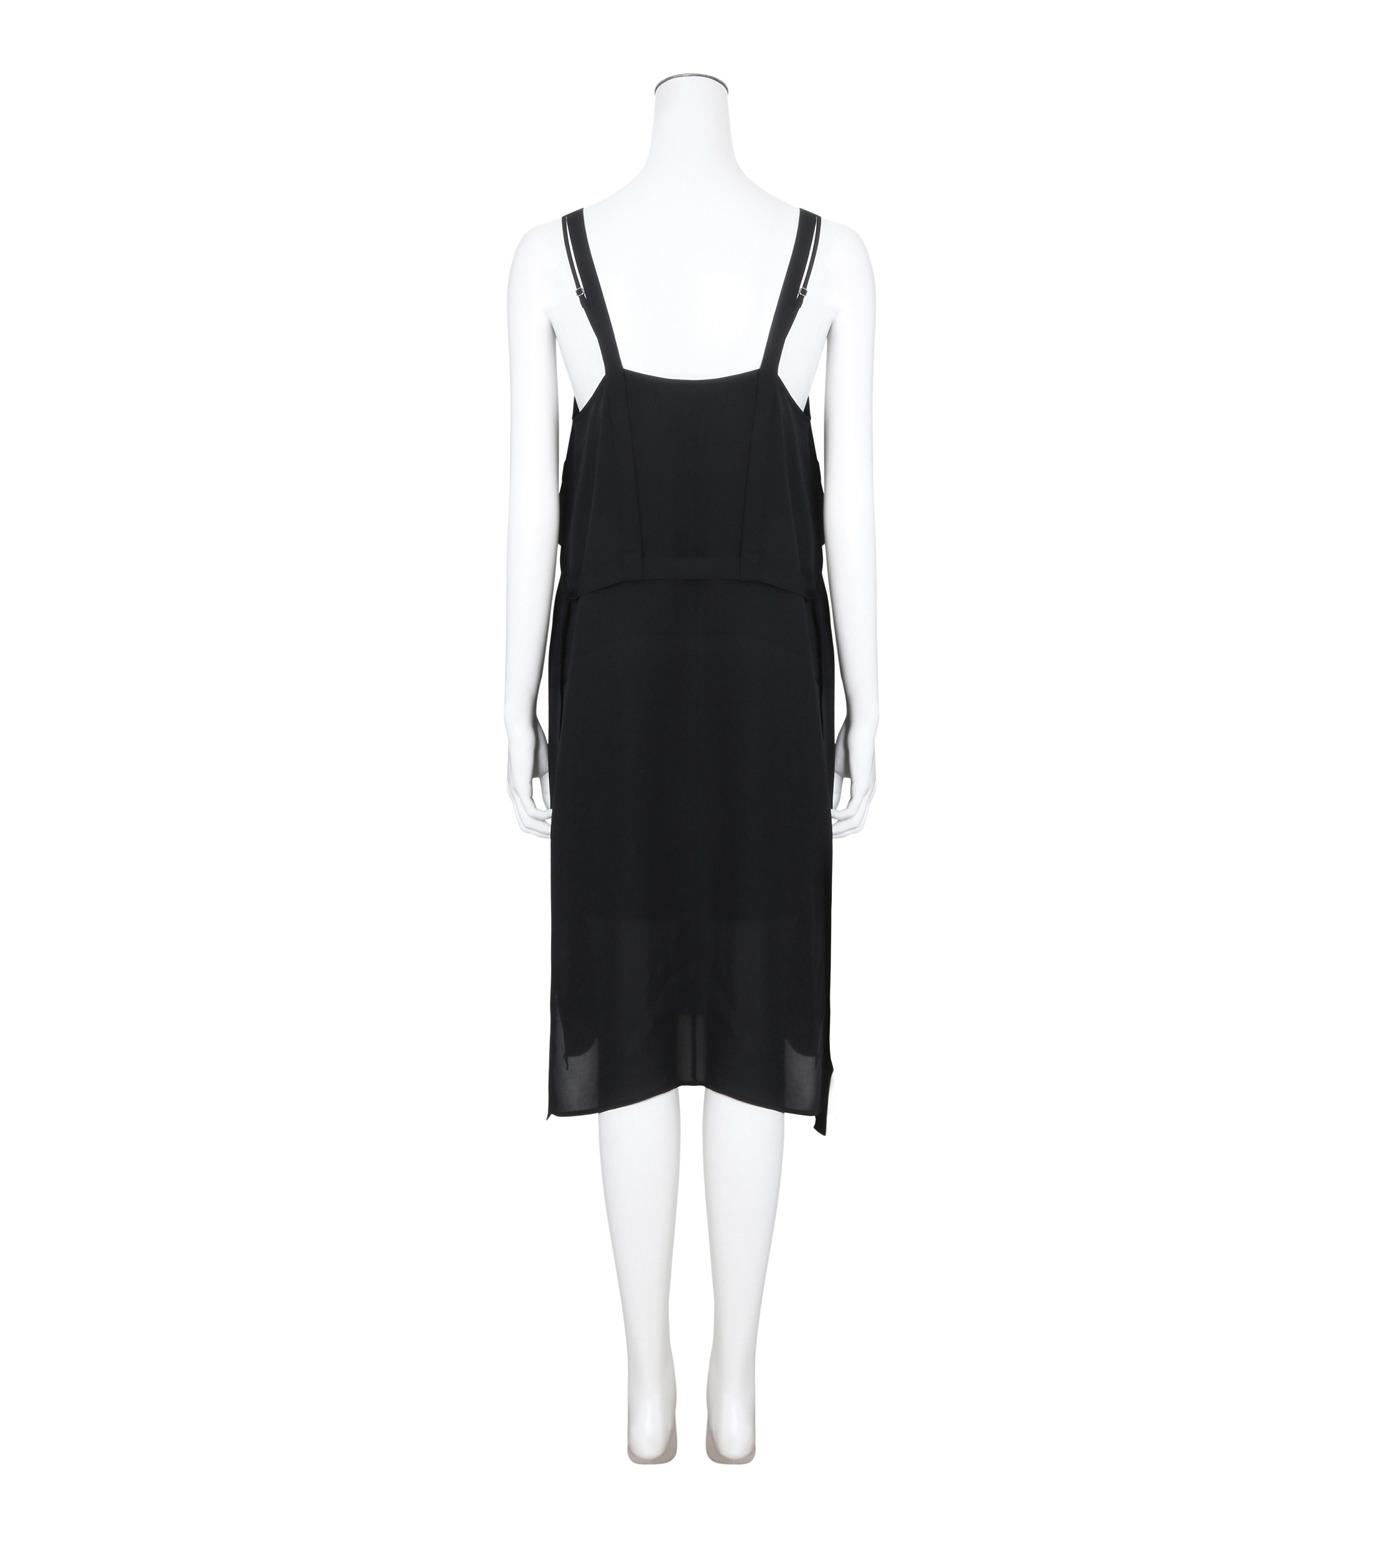 T by Alexander Wang(ティーバイ アレキサンダーワン)のPleated Front Tie Tank Dress-BLACK(ワンピース/one piece)-403417R17-13 拡大詳細画像2